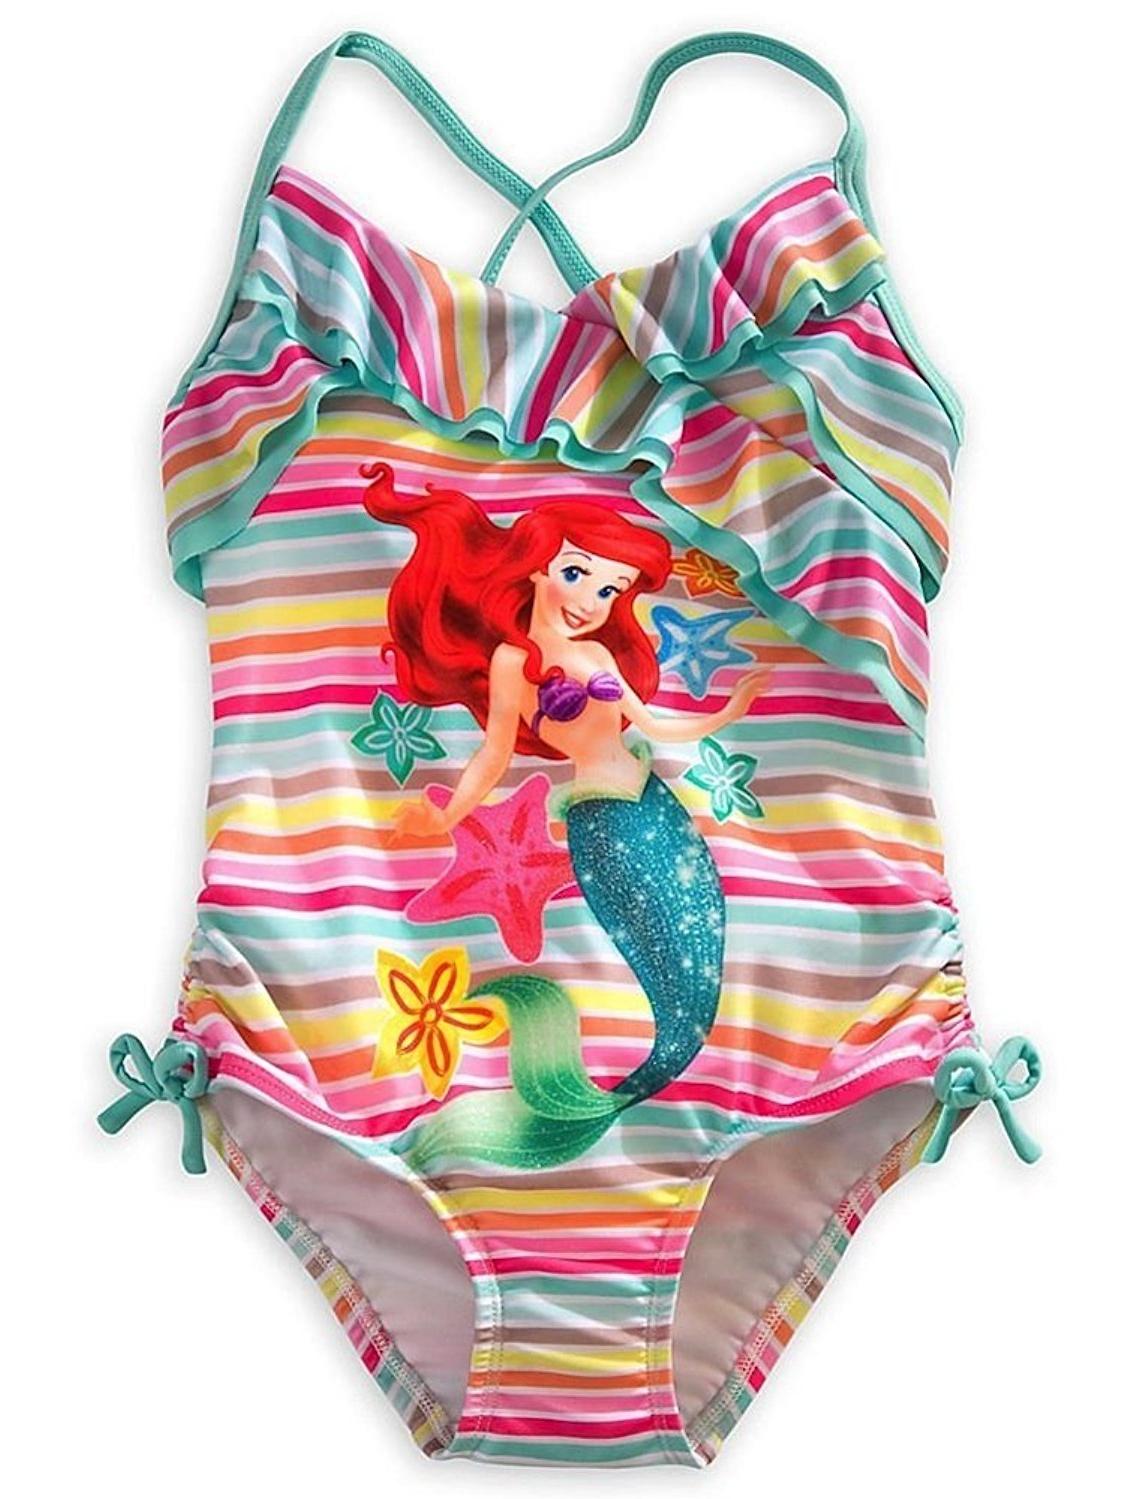 Ariel - The Little Mermaid - Sea Green Rainbow Swimsuit for Girls